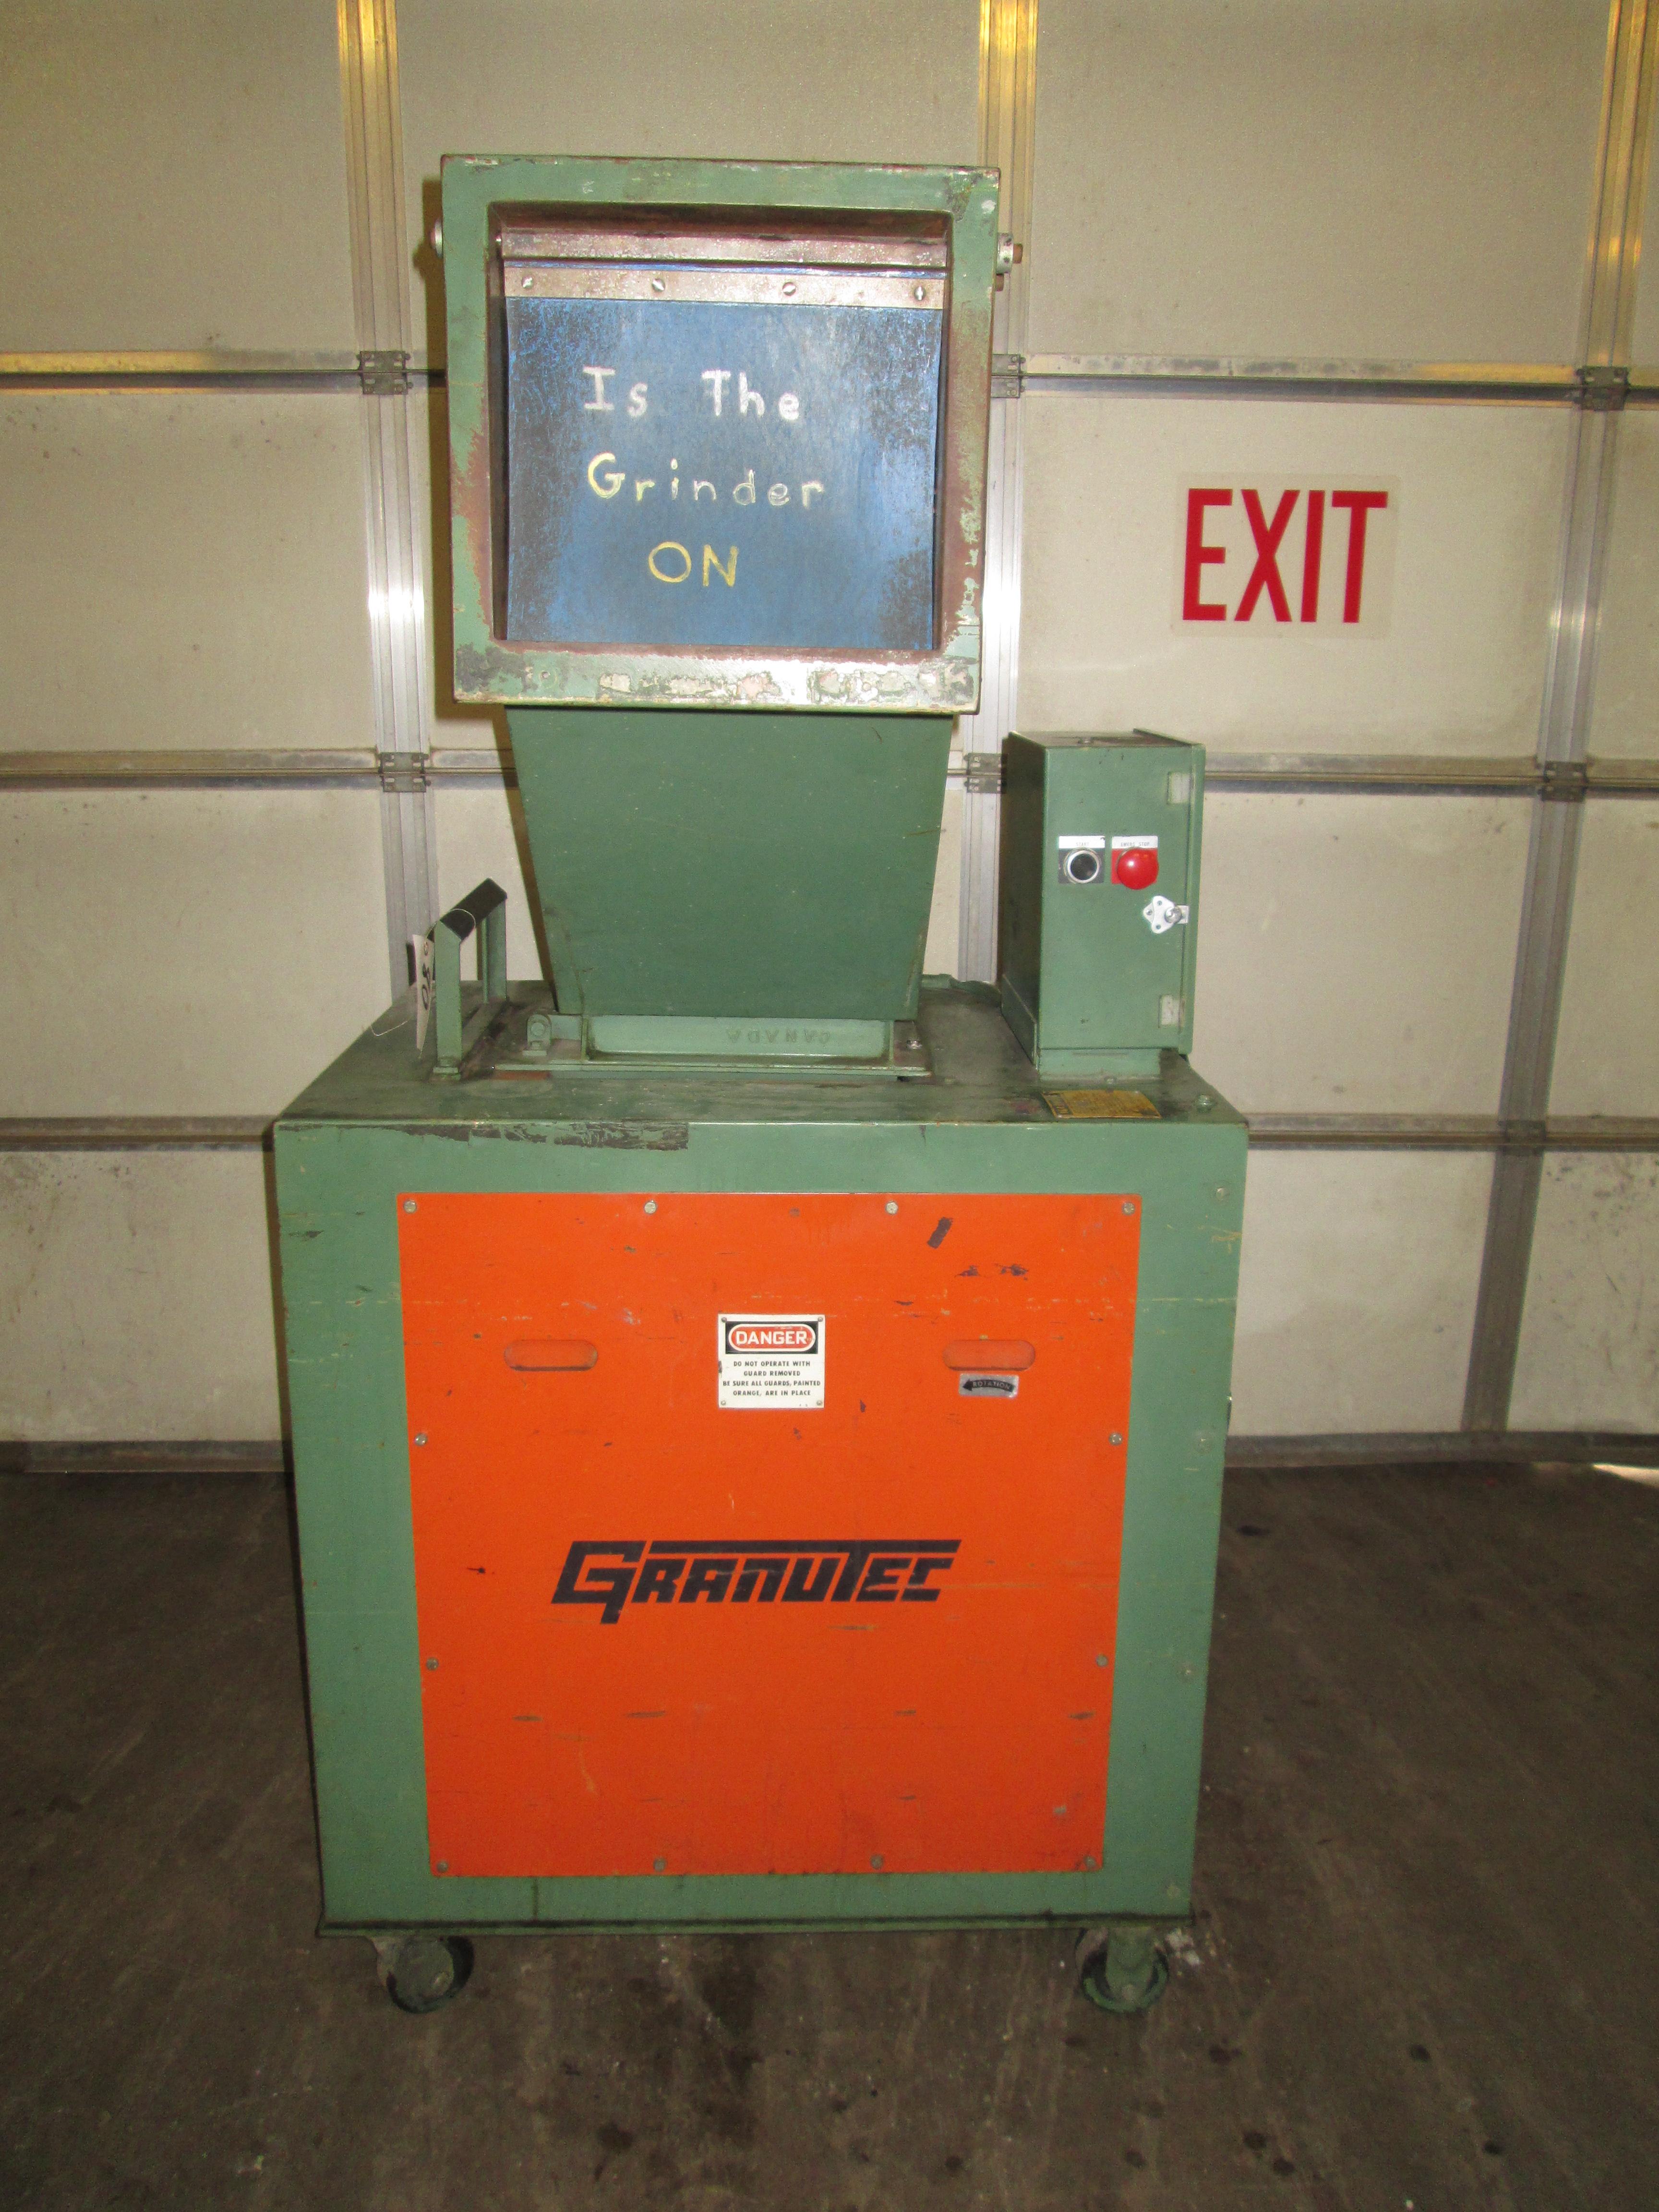 Granutec Granulator